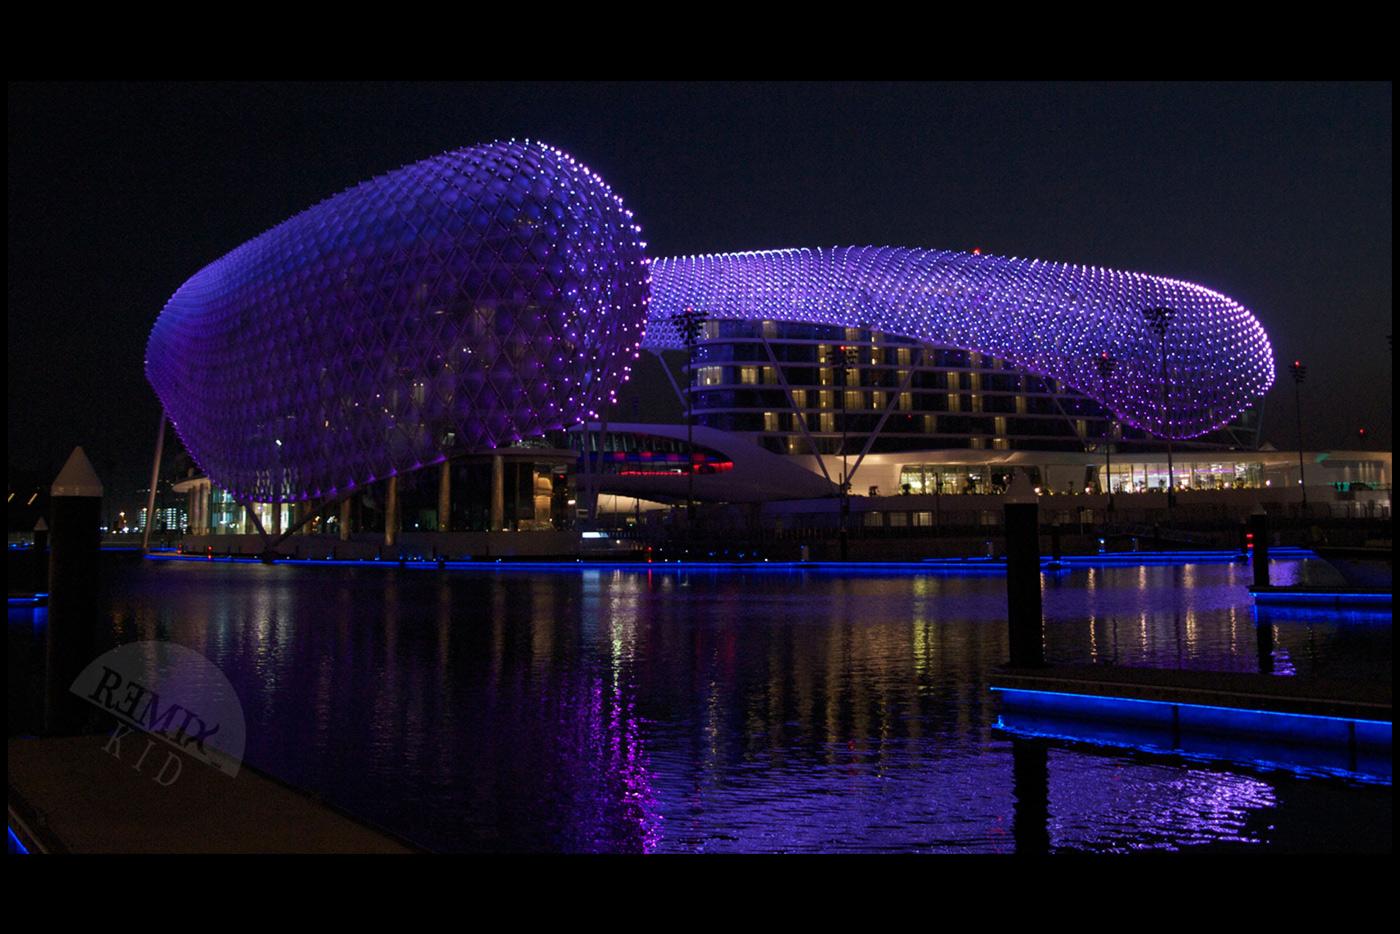 DJ Remixkid - Formula 1 DJ, Yas Marriott Hotel, Abu Dhabi